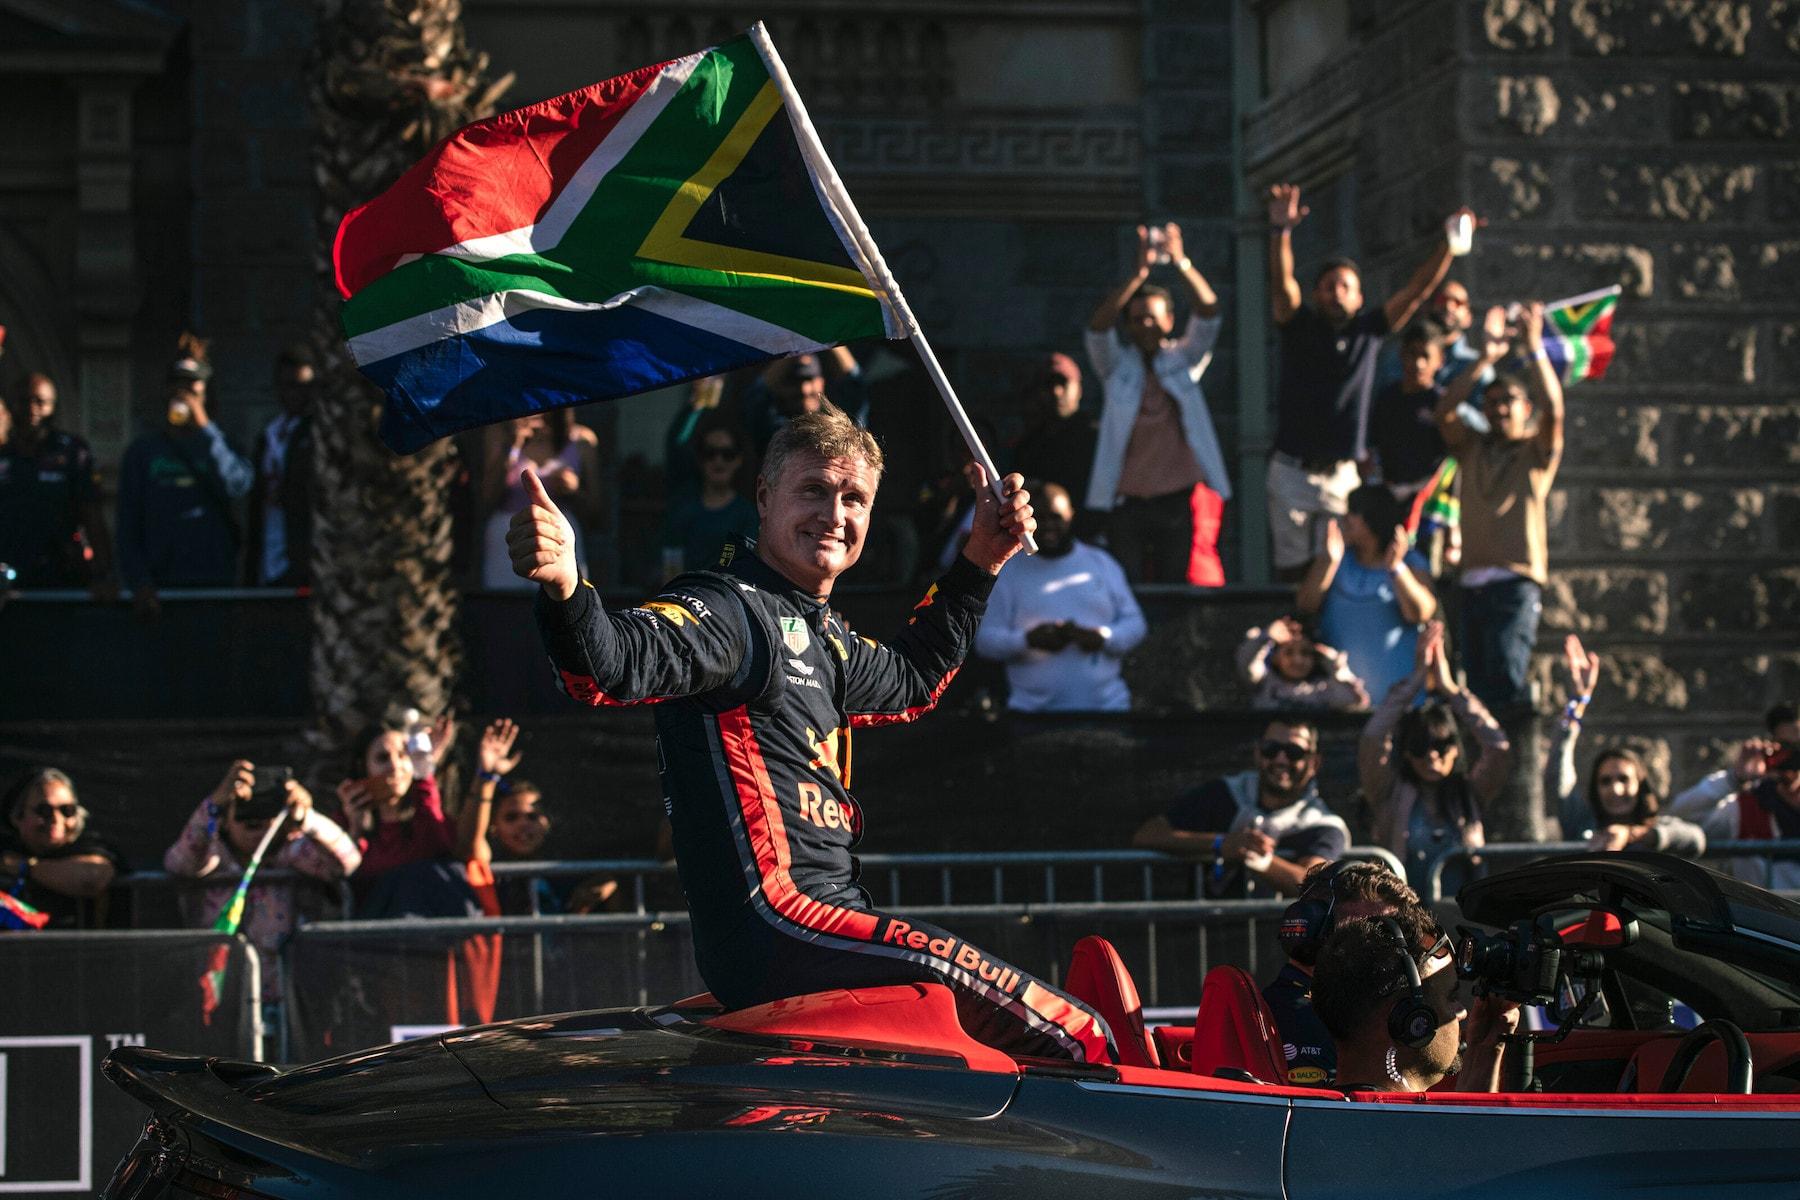 2019 RBR at South Africa 13.jpg